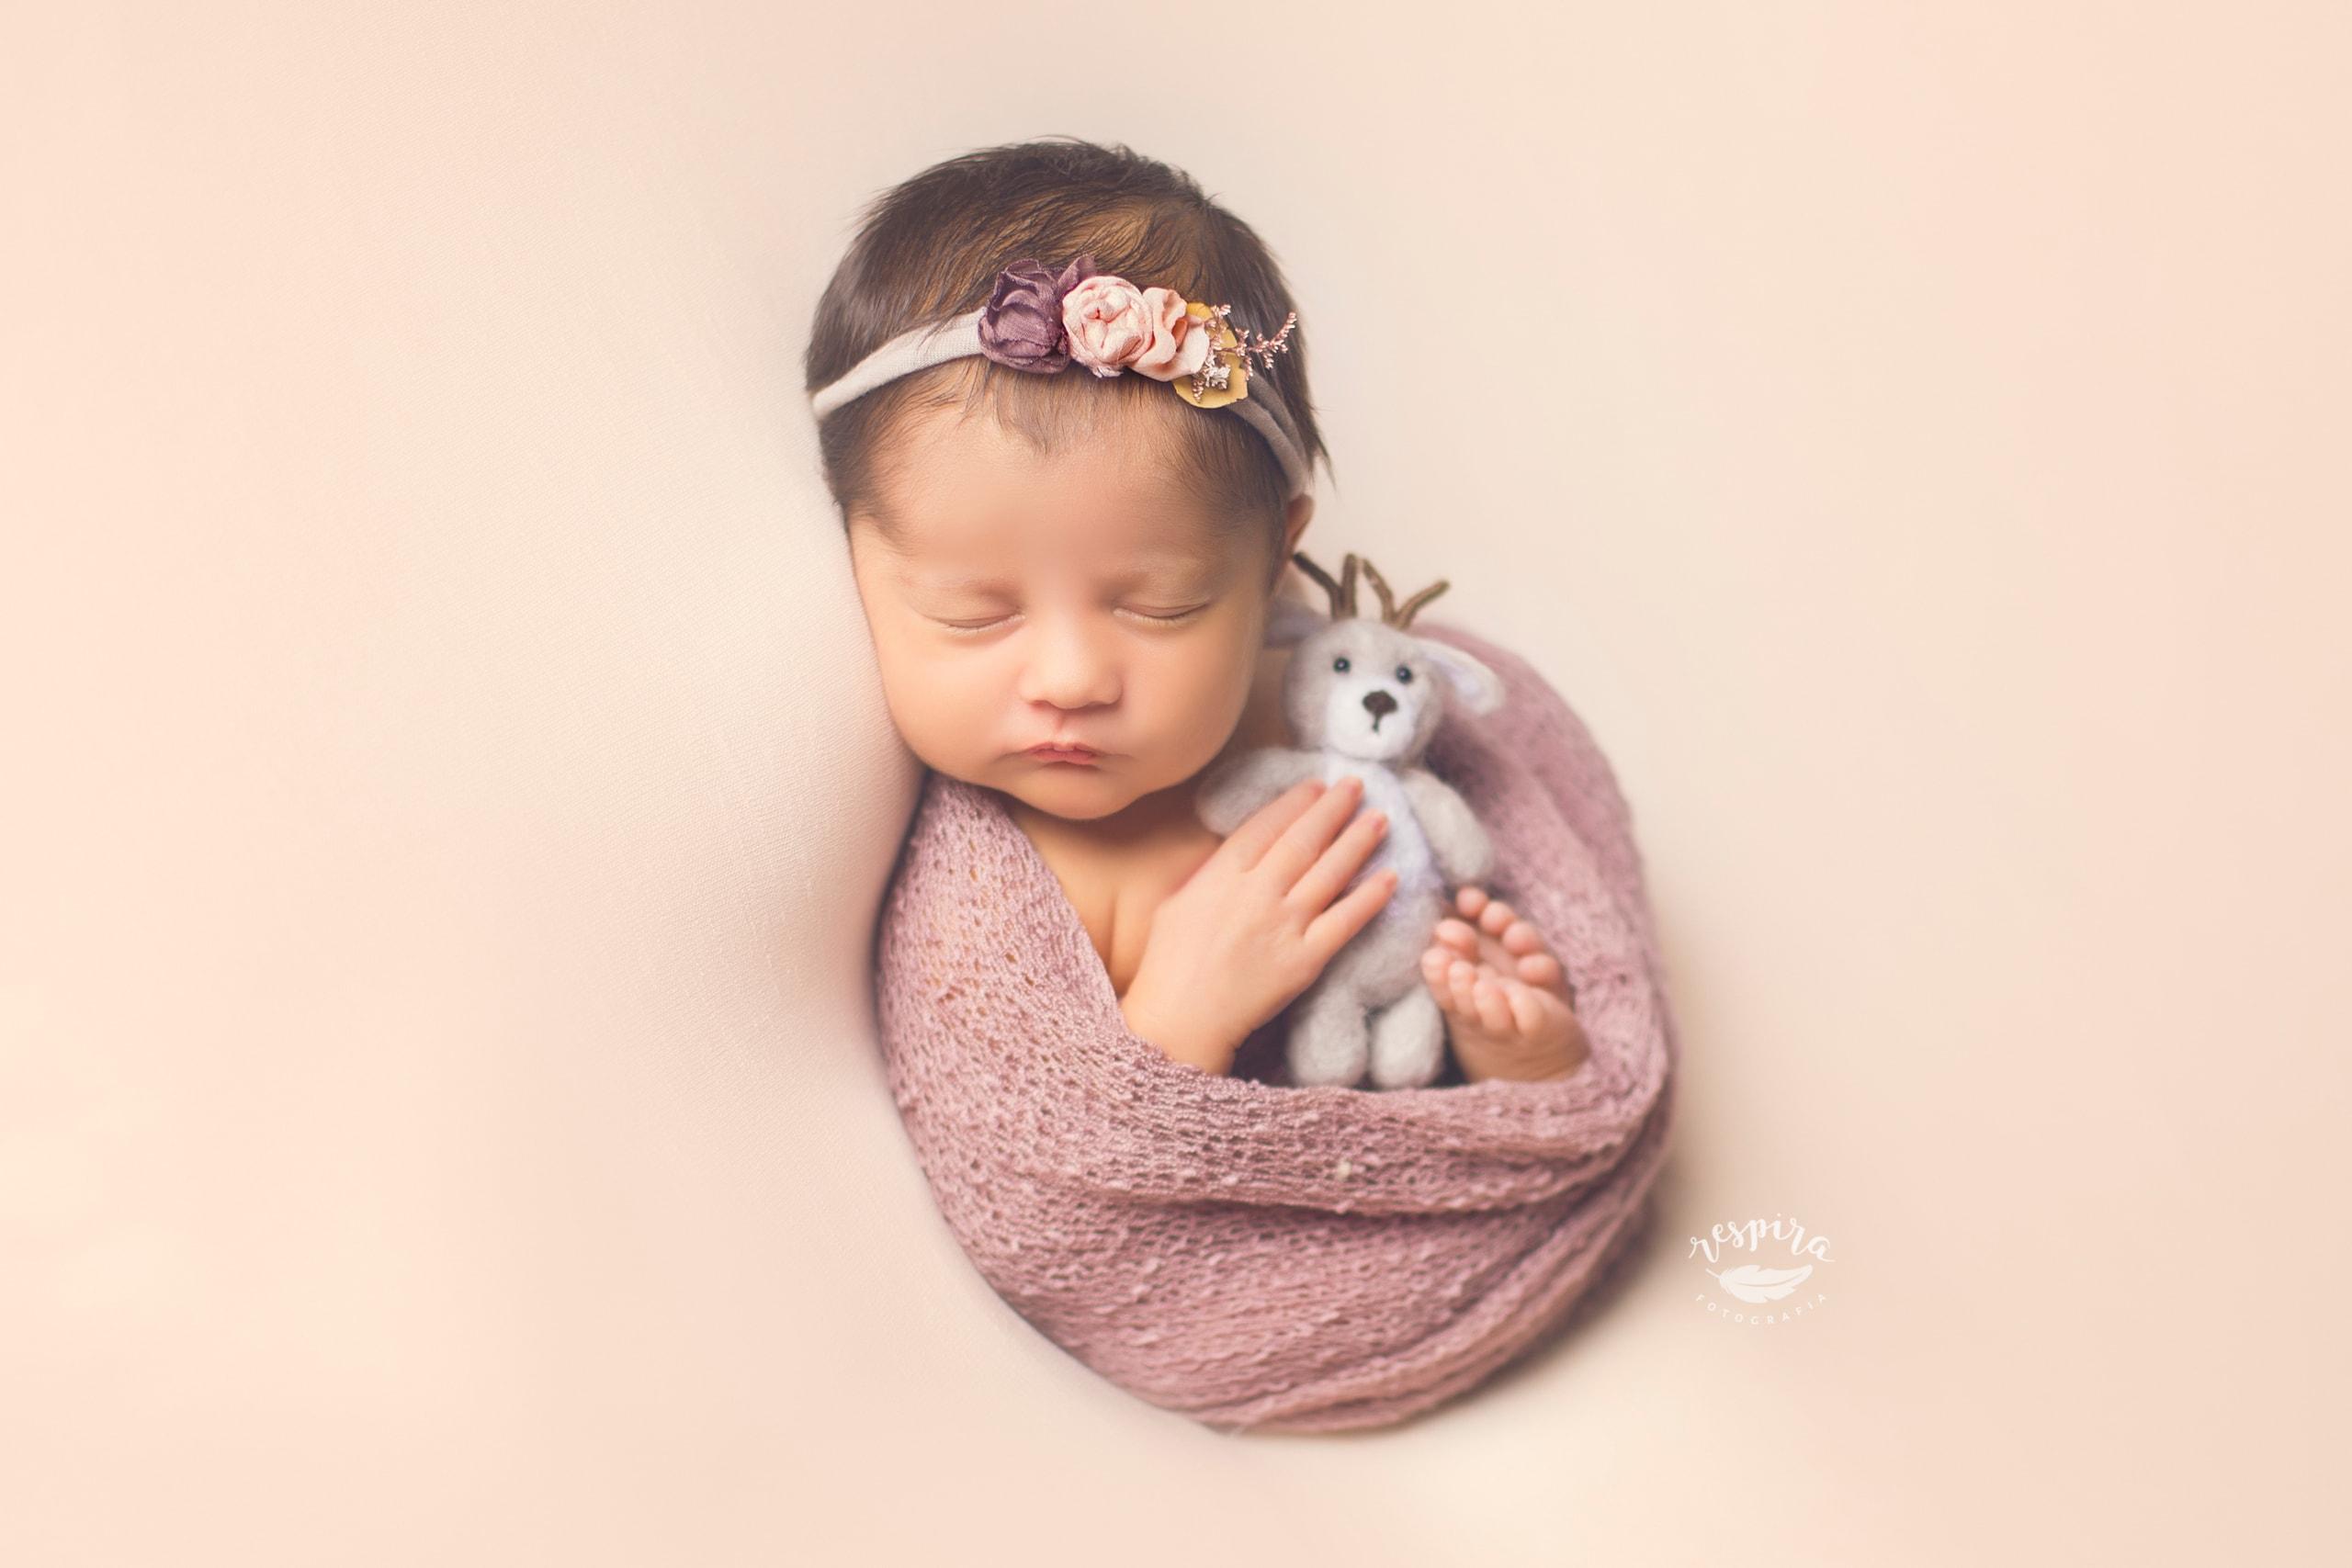 Fotografo de bebes newborn en barcelona olesa